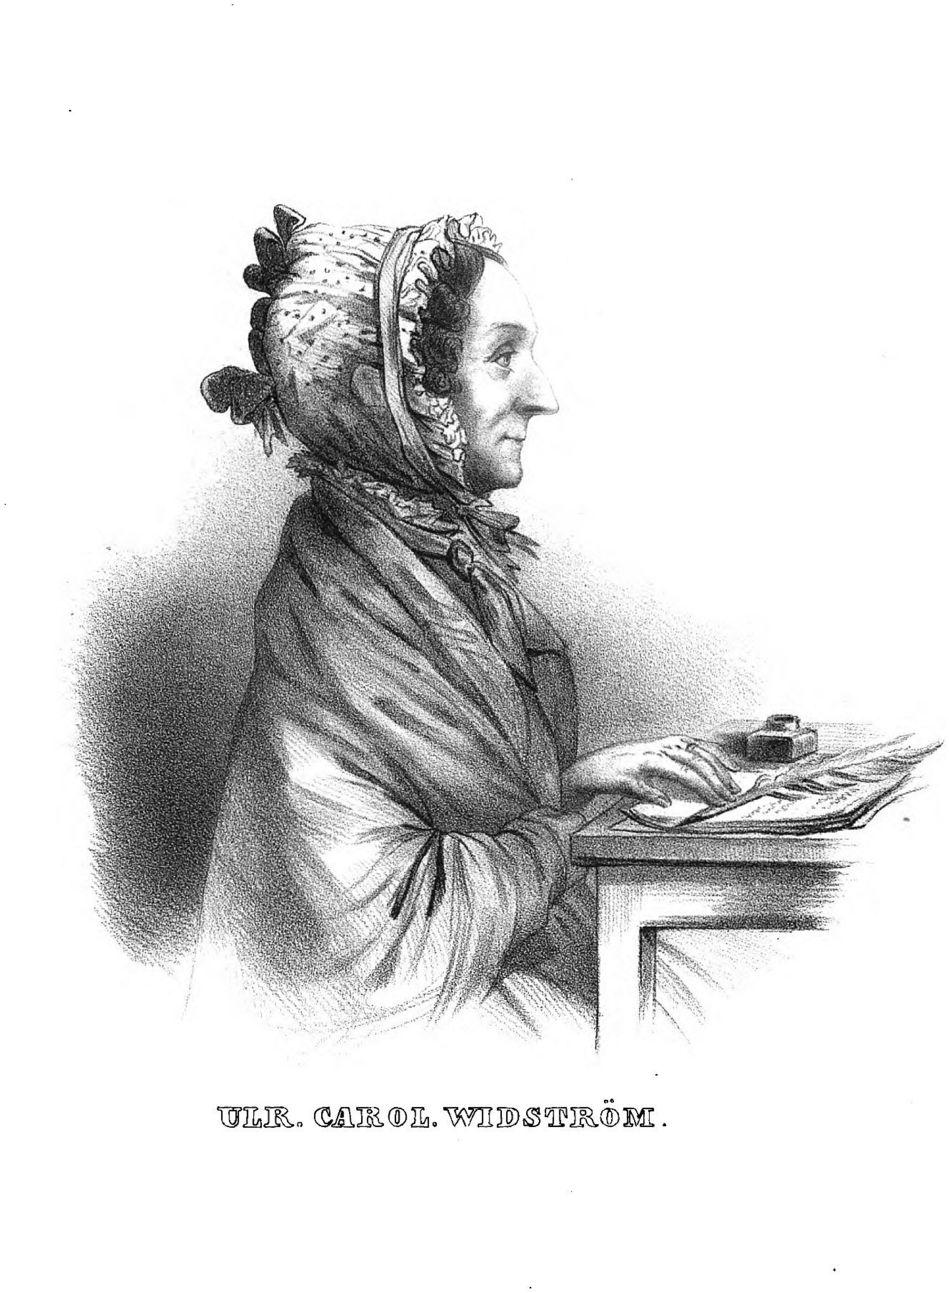 Ulrika Widström